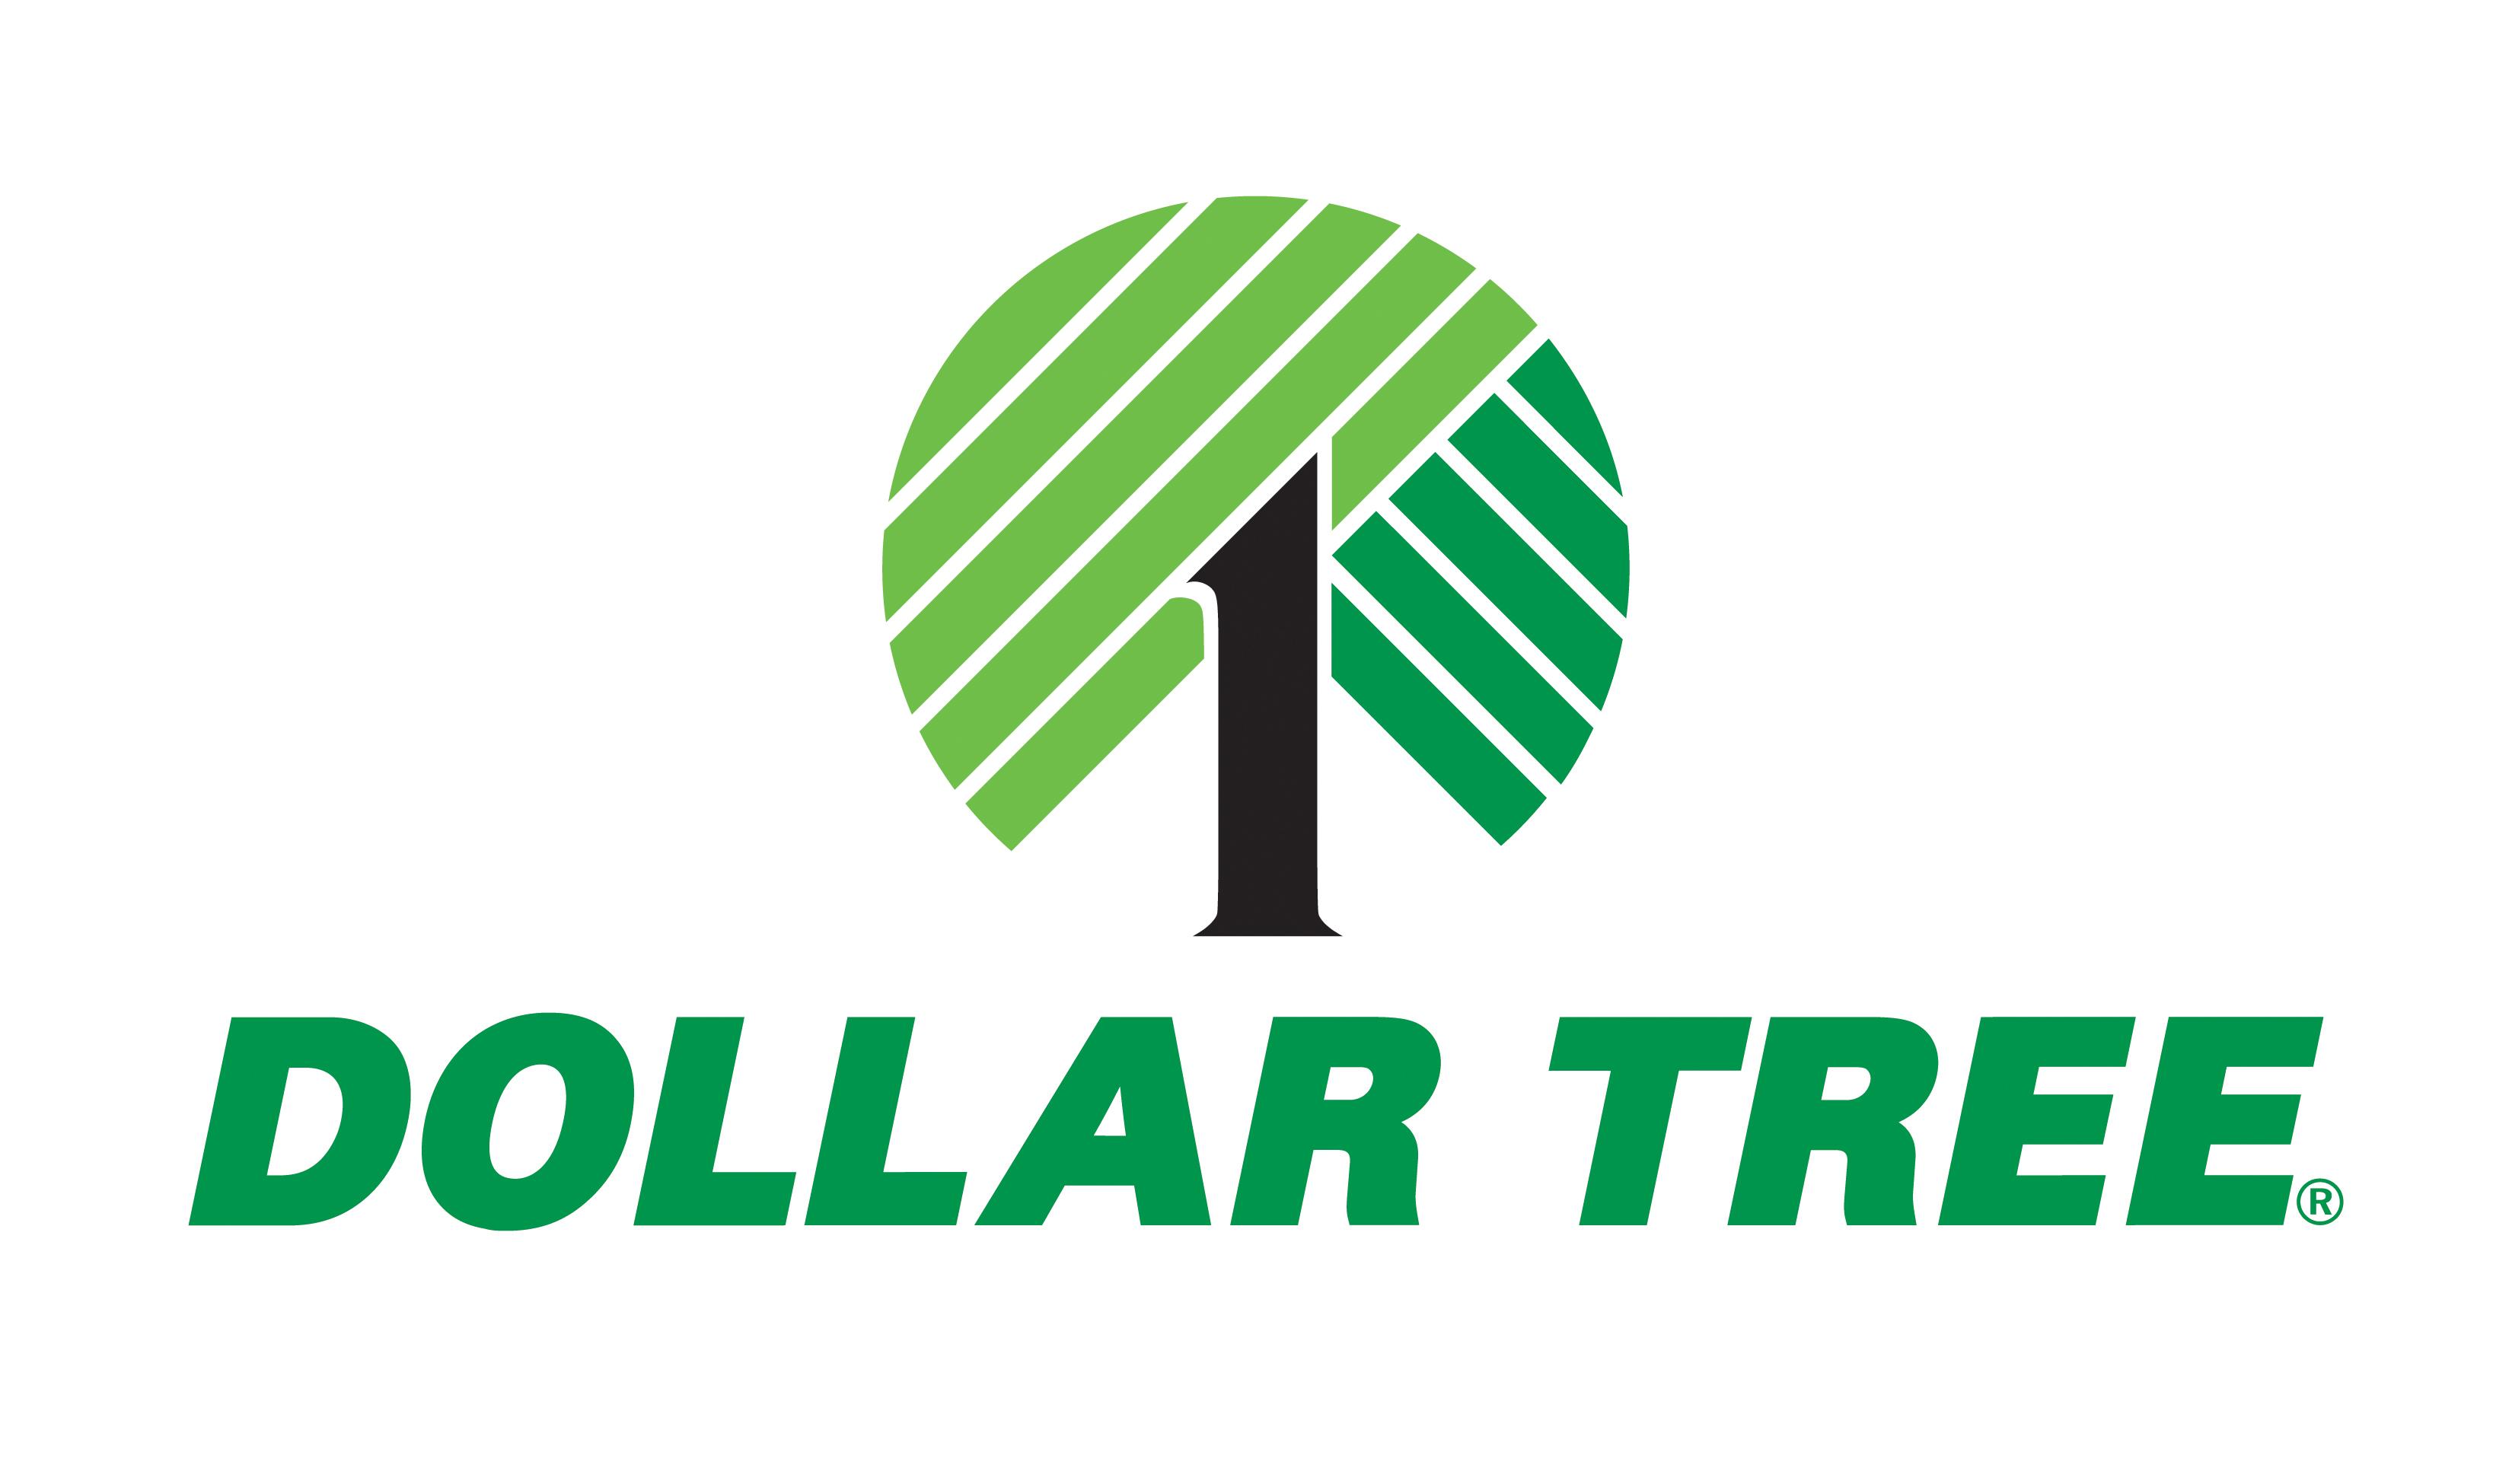 Dollar tree -